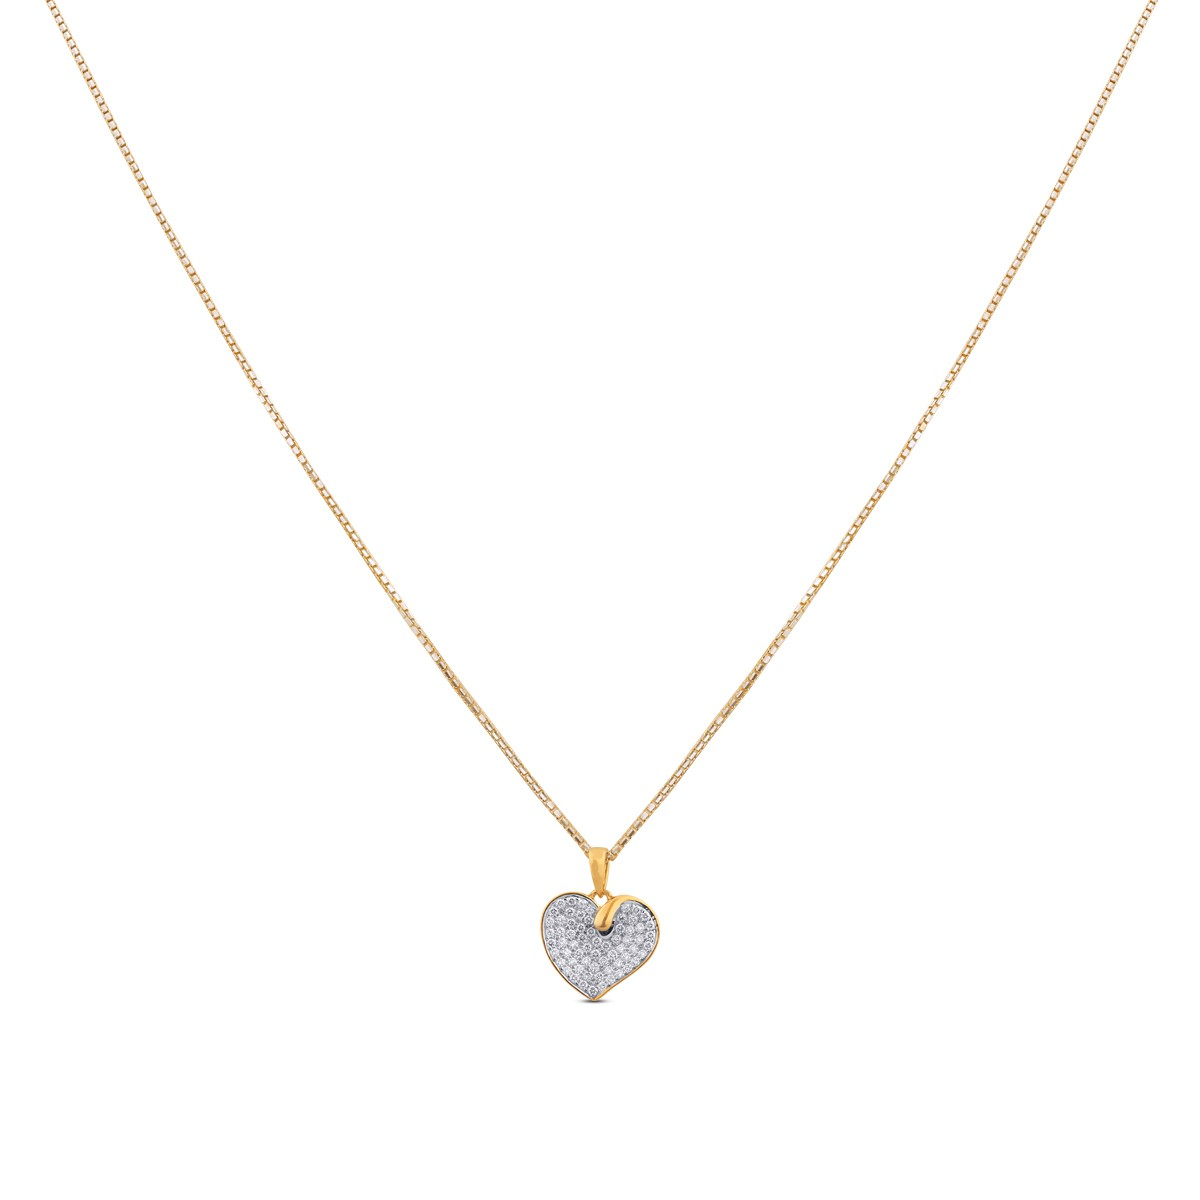 Yasmin Diamond & Yellow Gold Pendant with Chain